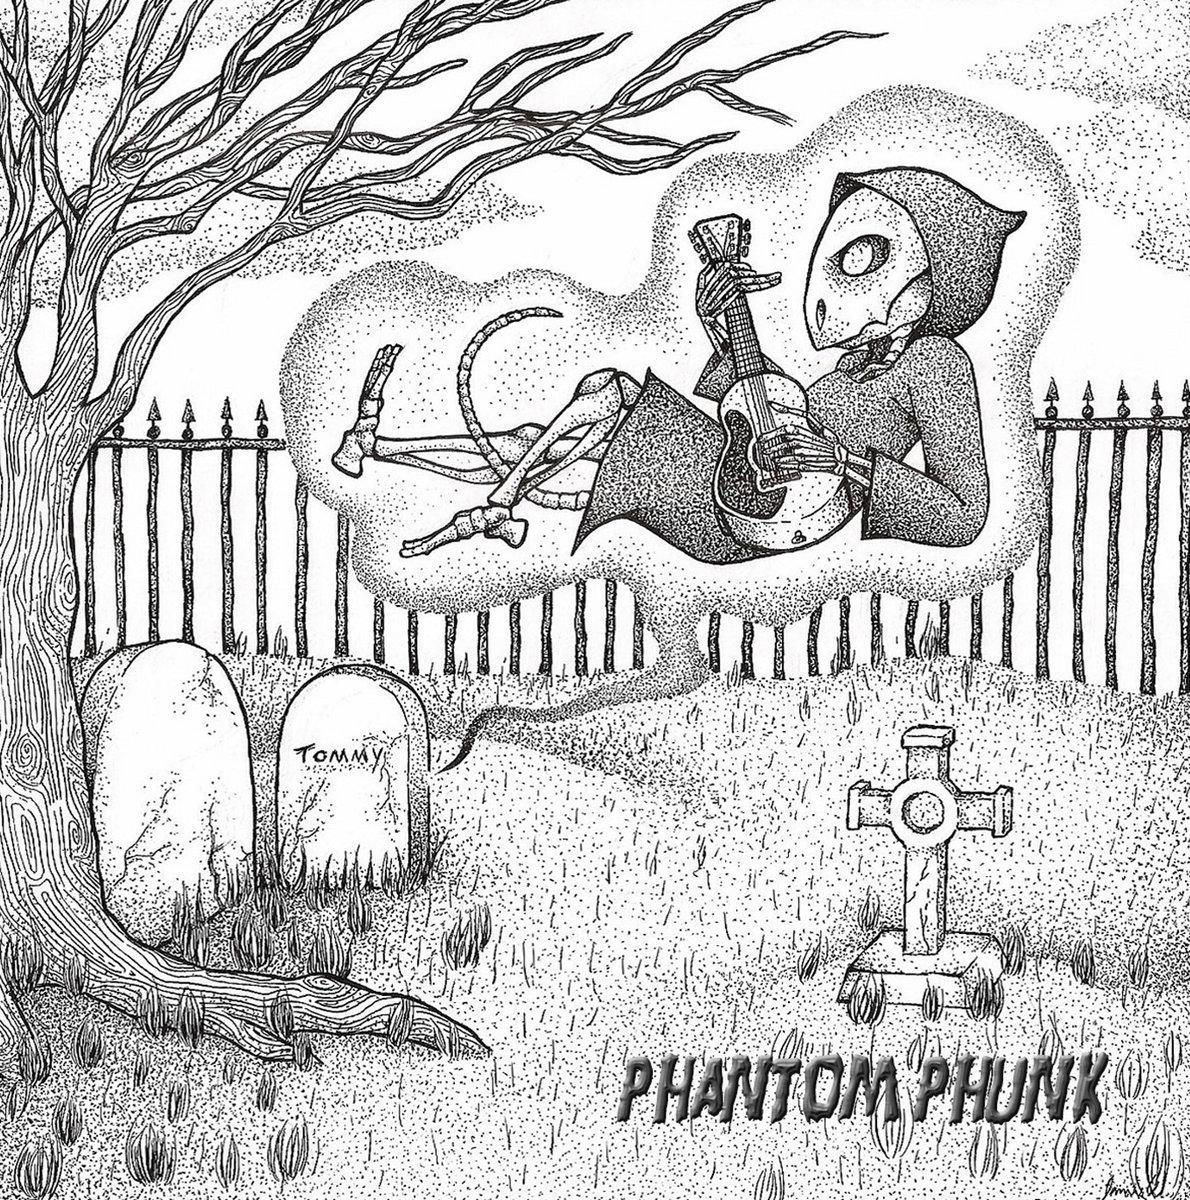 Tommy's Cosmic Avocado | Phantom Phunk